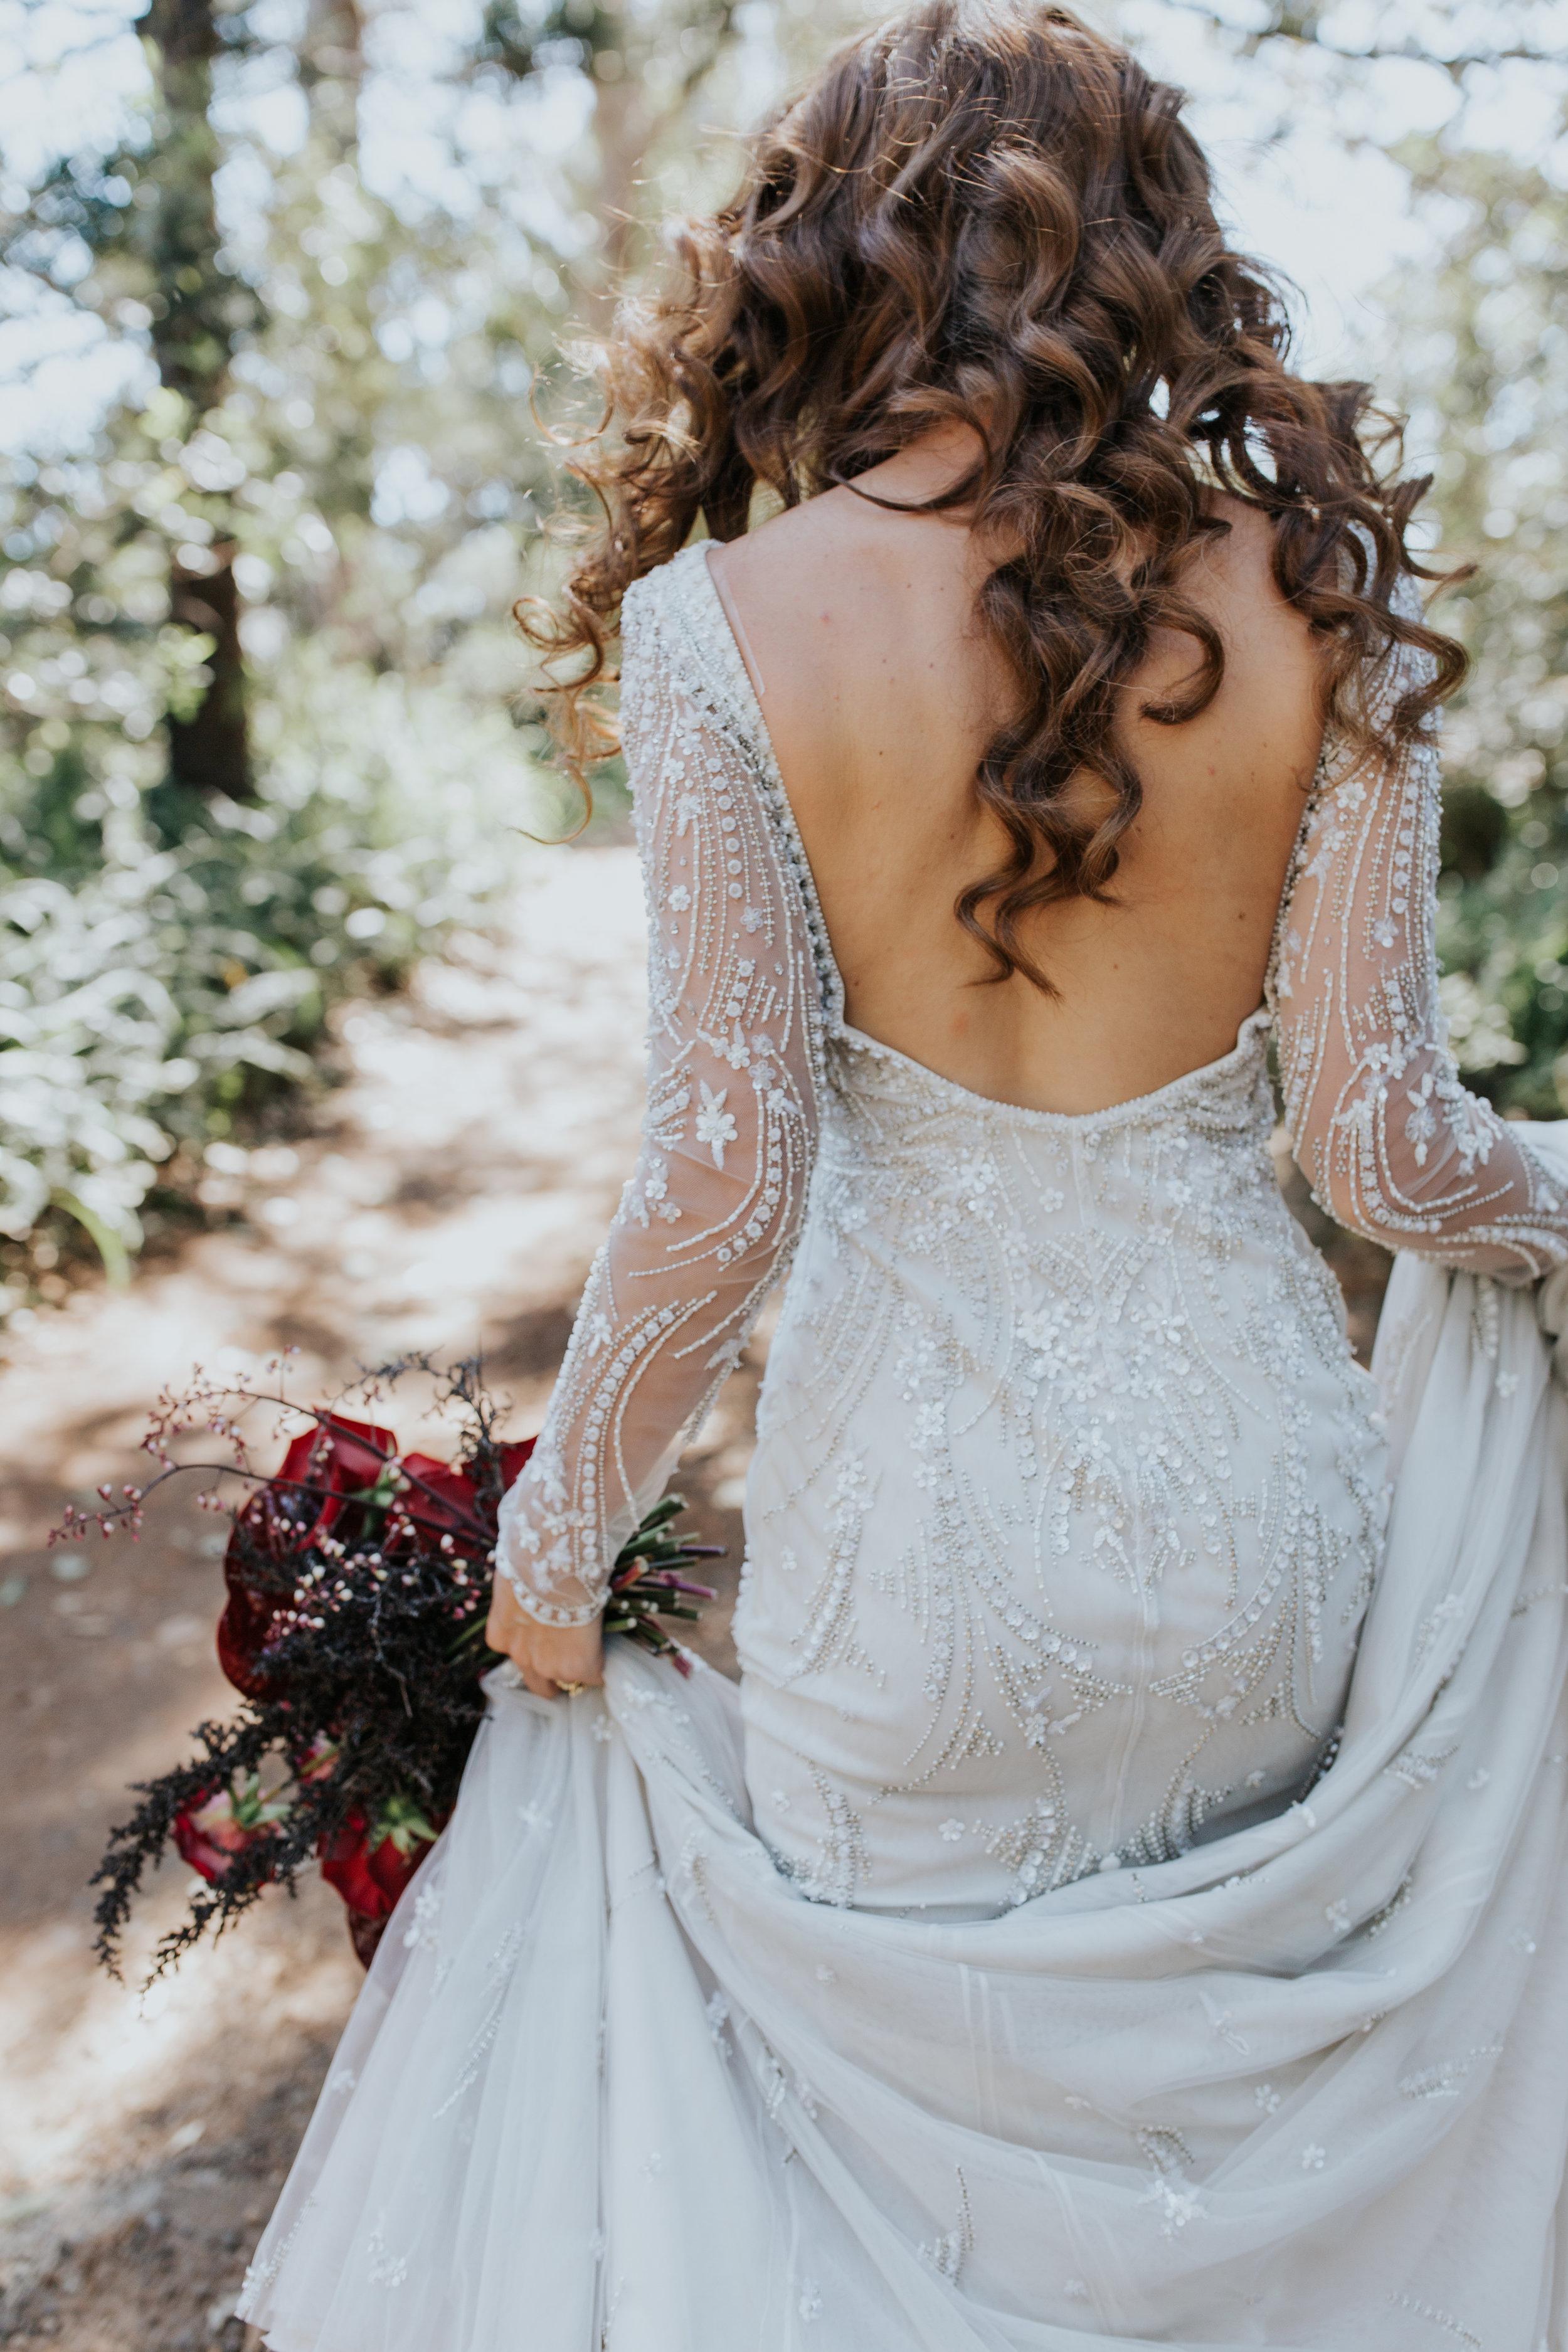 Kodan+CandaceWedding_MSP_HighRes (278 of 1218).jpgBloodwood Botanica | Maleny red wedding flowers